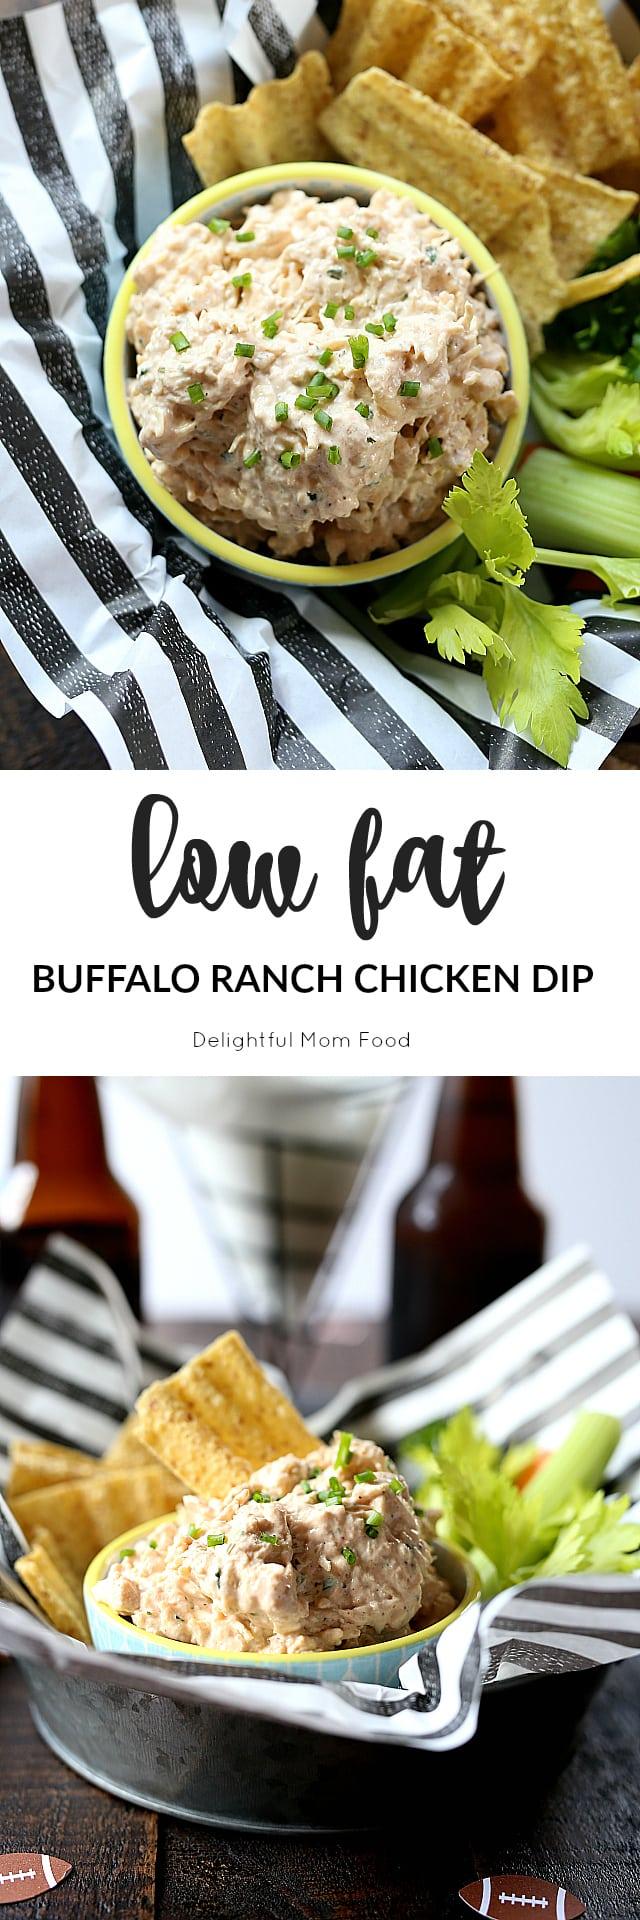 Healthy Buffalo Ranch Chicken Dip